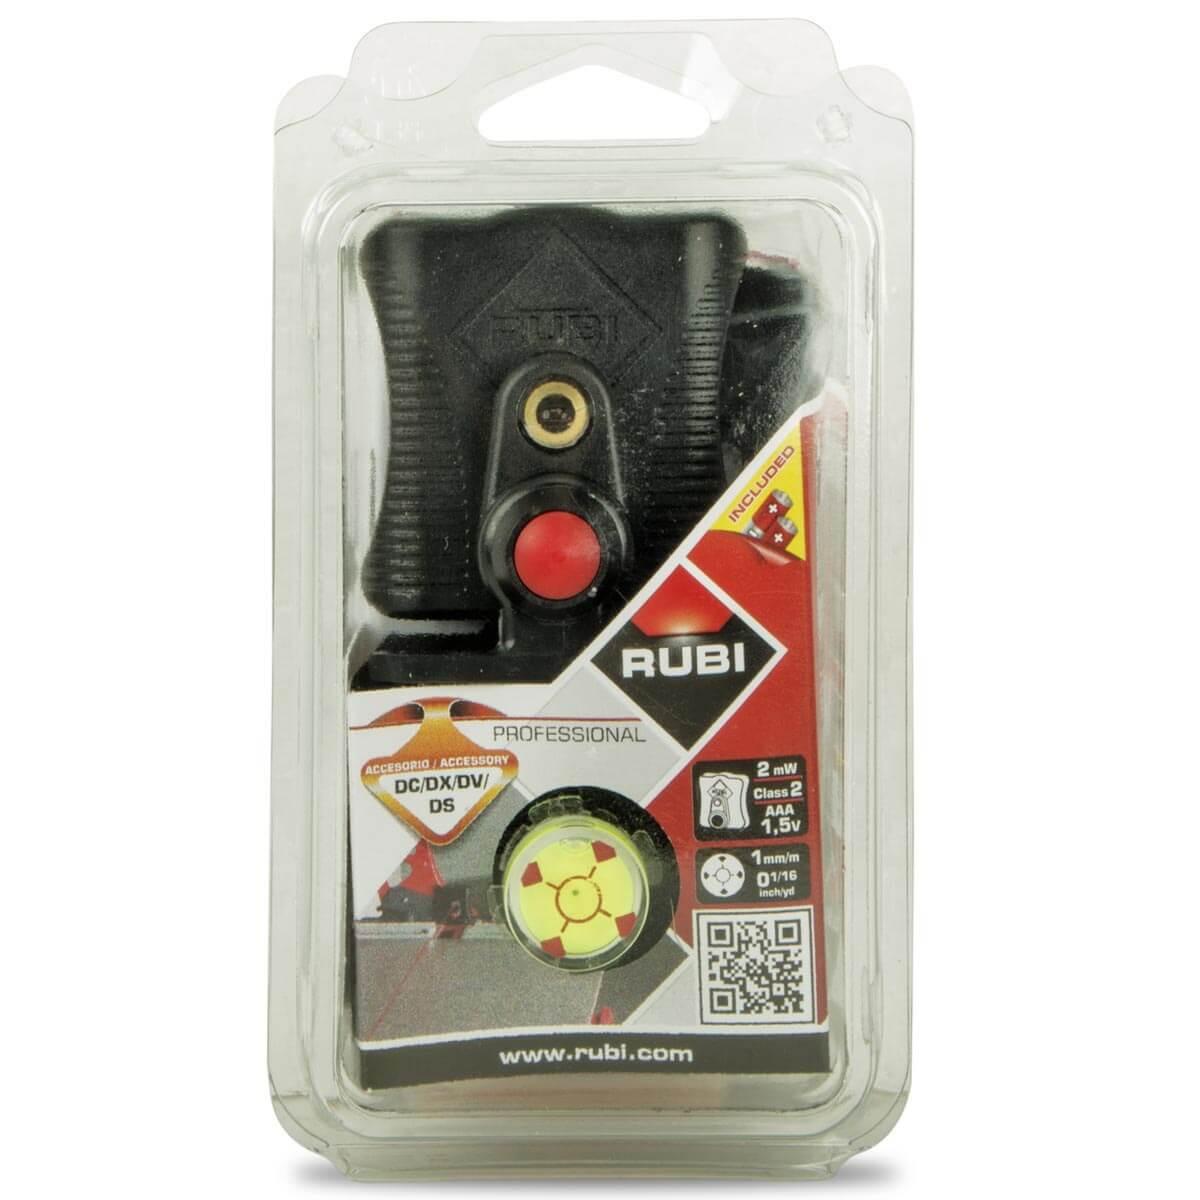 54999 Rubi Laser Level package